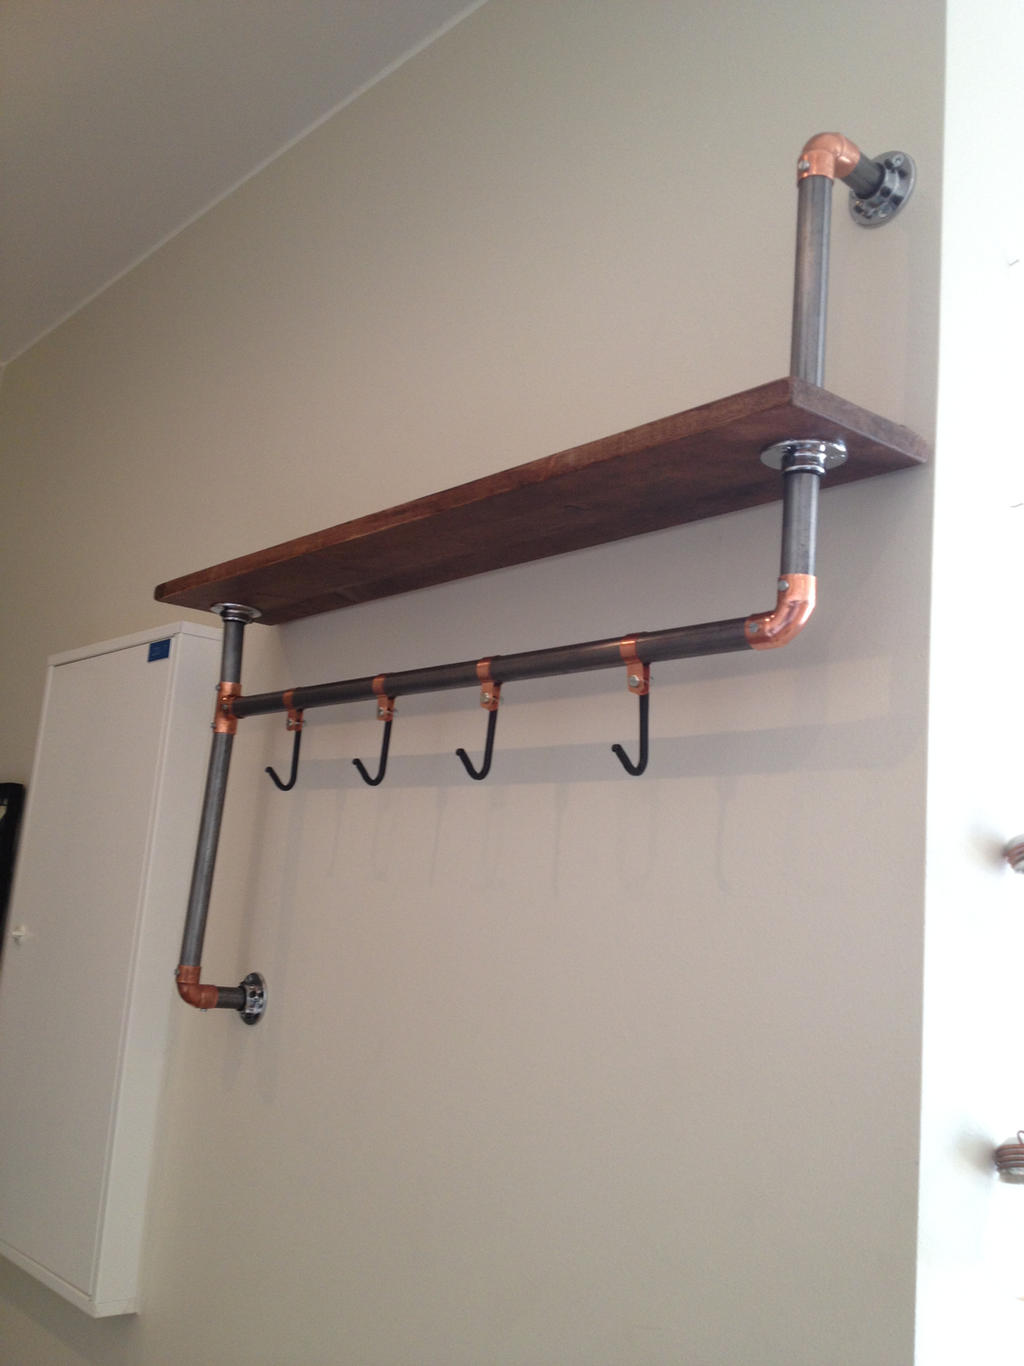 Steampunk shelf / cloth hanger thingemajigger